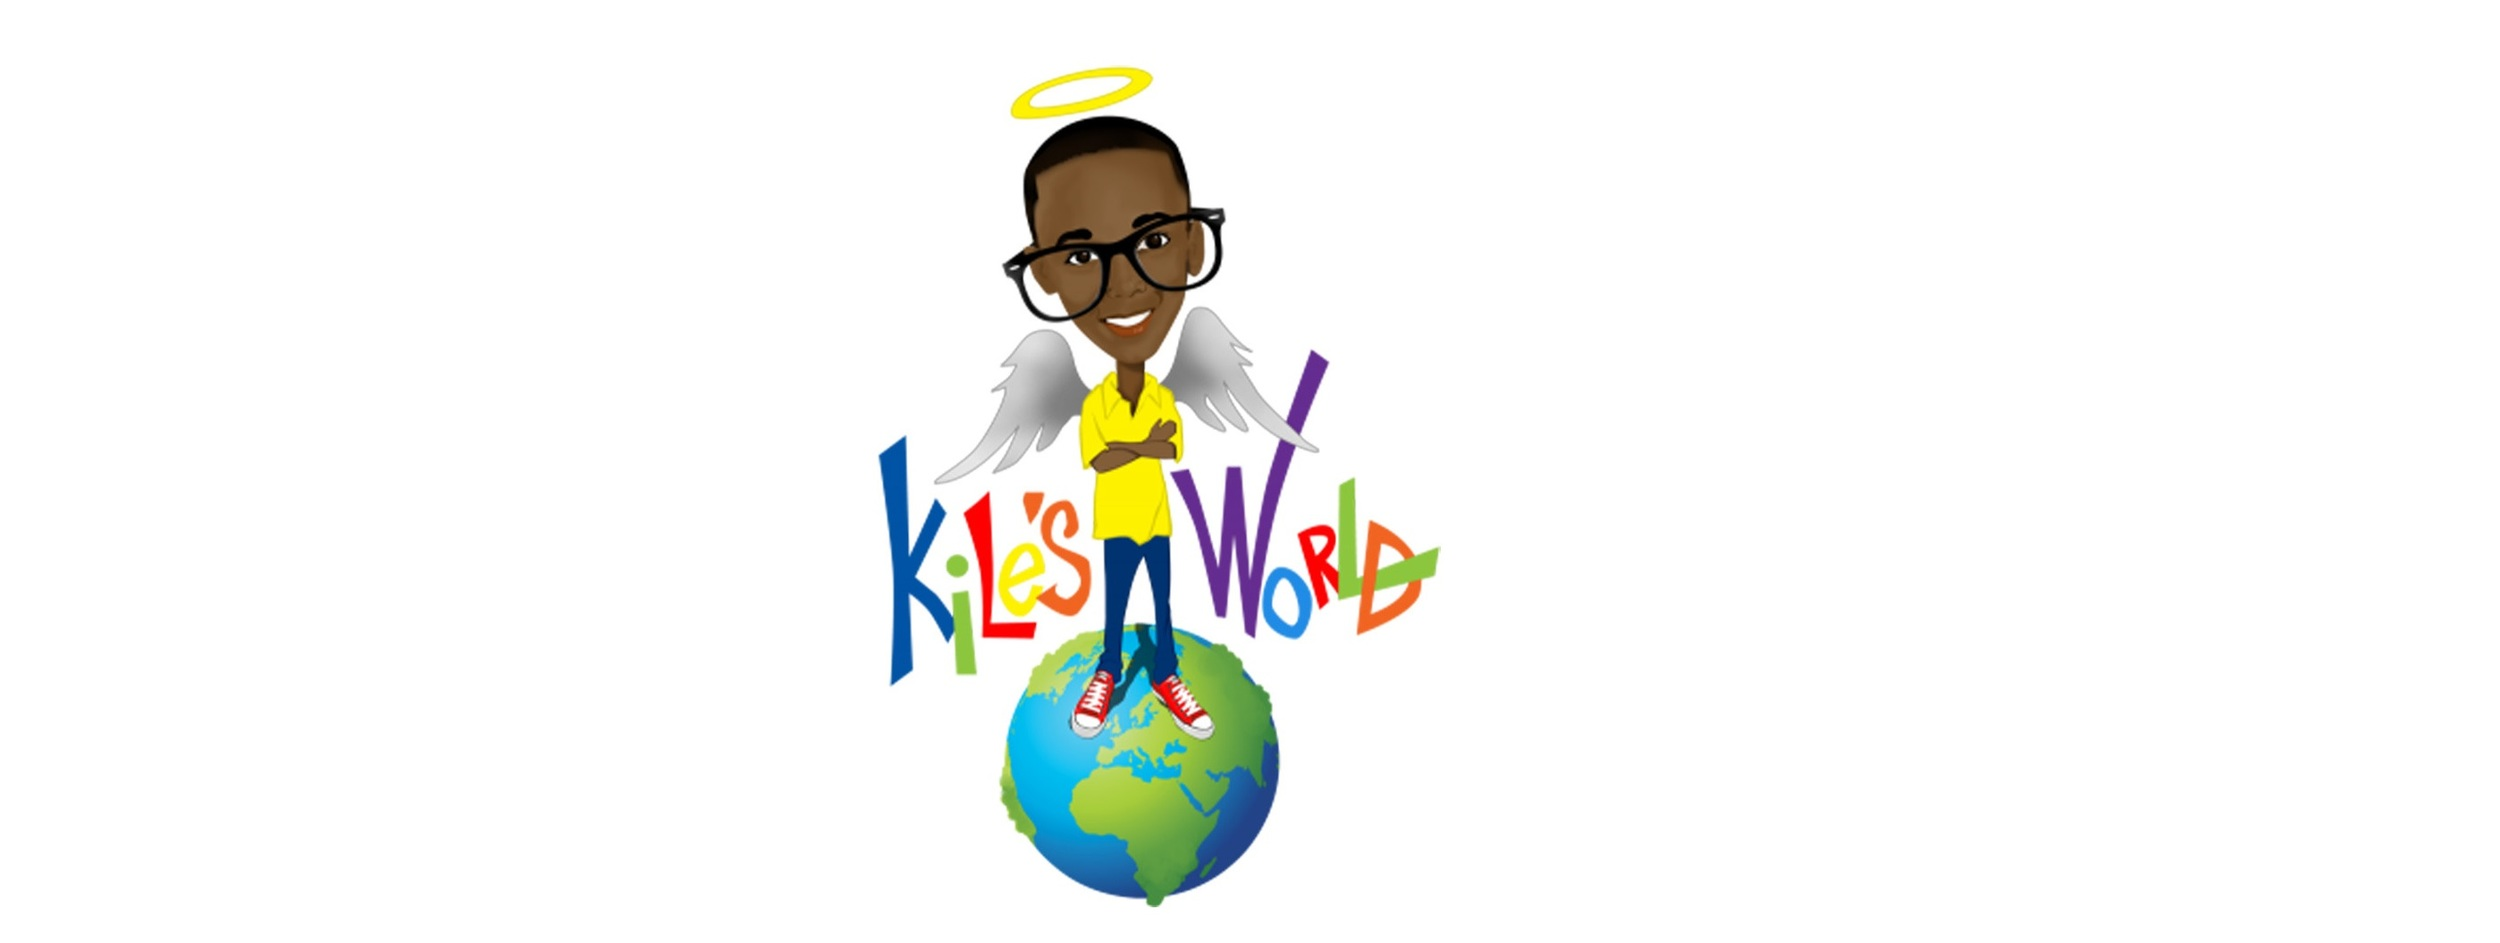 KILE'S WORLD